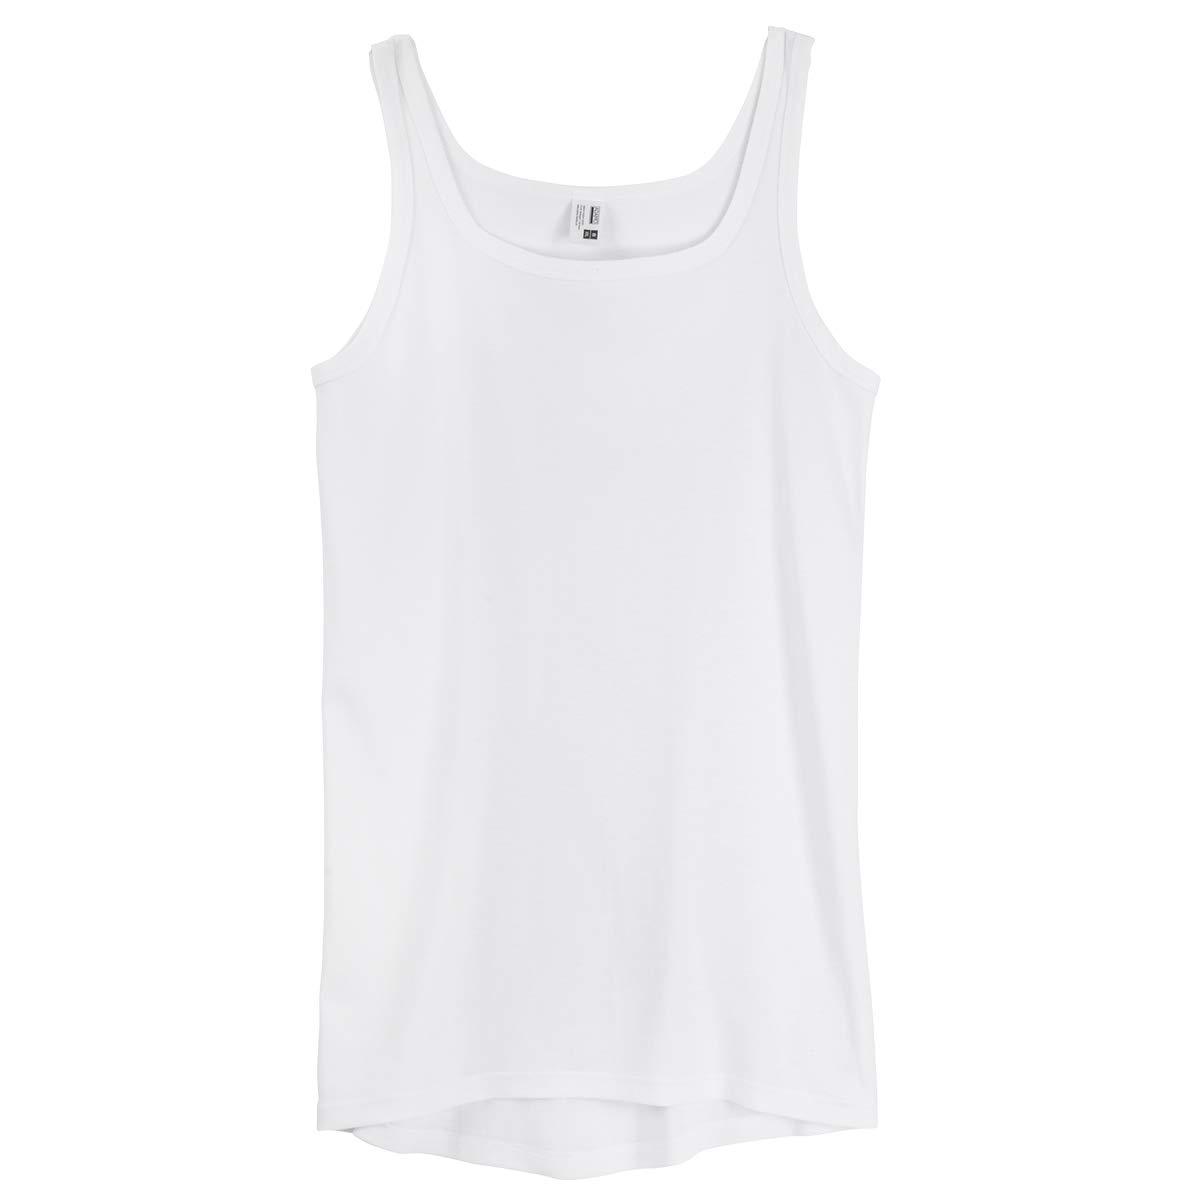 4fae7881c075b Débardeur Hommes Grande Taille Blanc Adamo Fashion: Amazon.fr ...